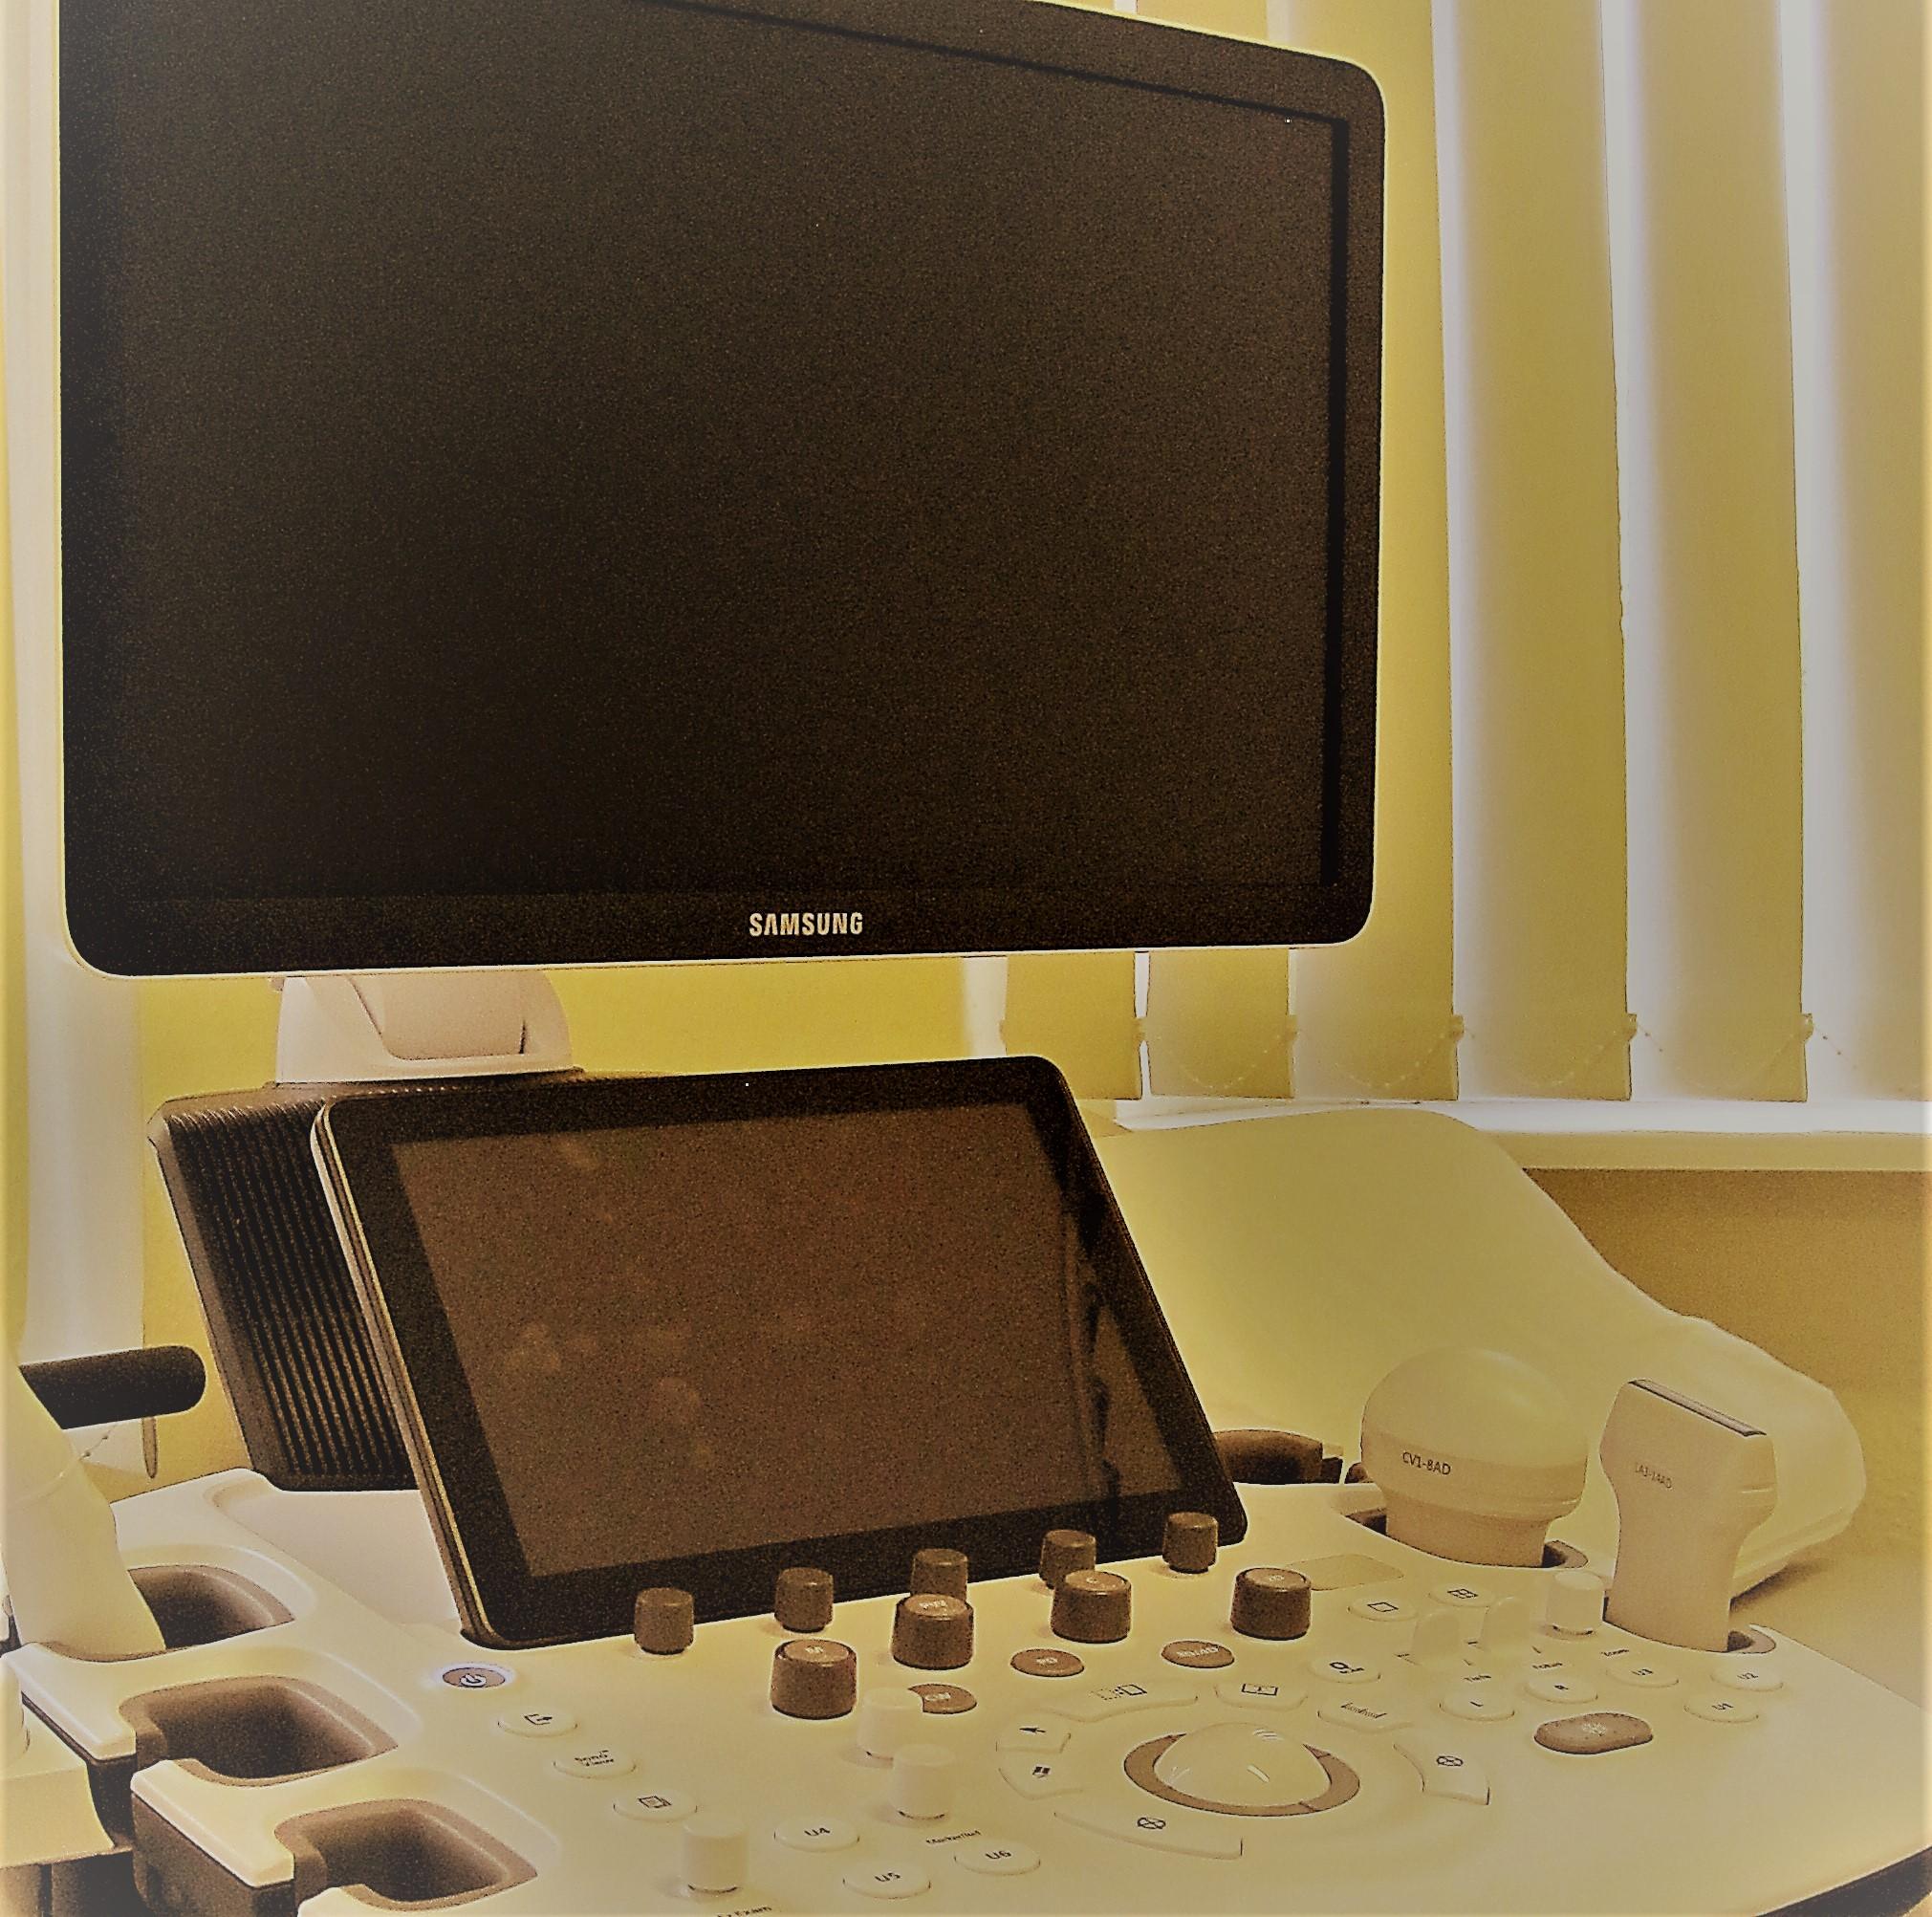 Ultraschallgerät Samsung HS 60